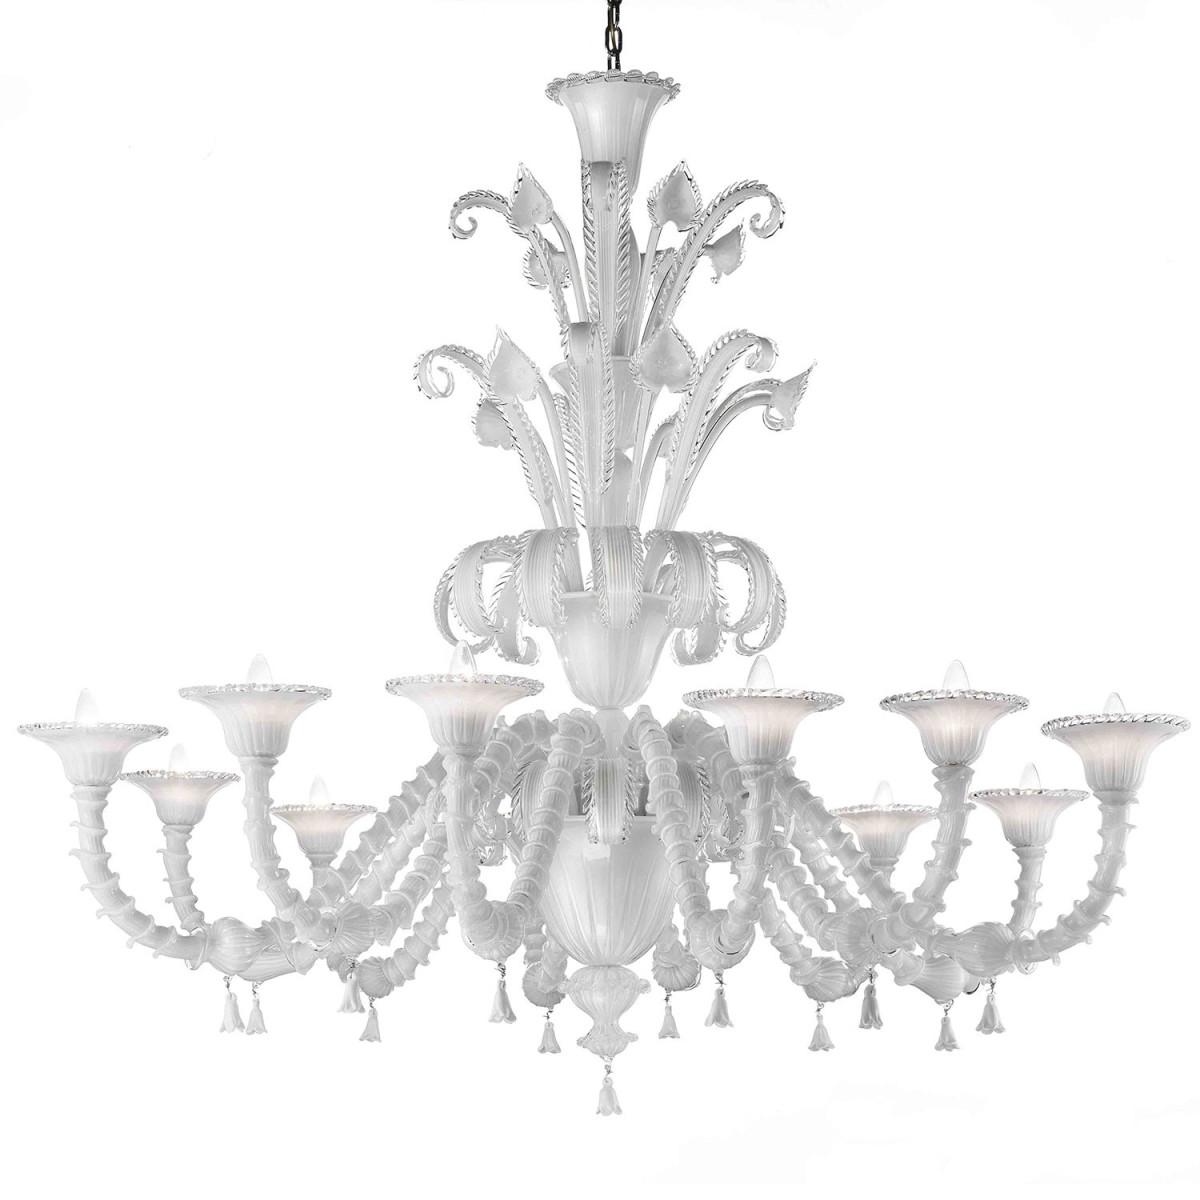 teseo lustre en verre de murano murano glass chandeliers. Black Bedroom Furniture Sets. Home Design Ideas